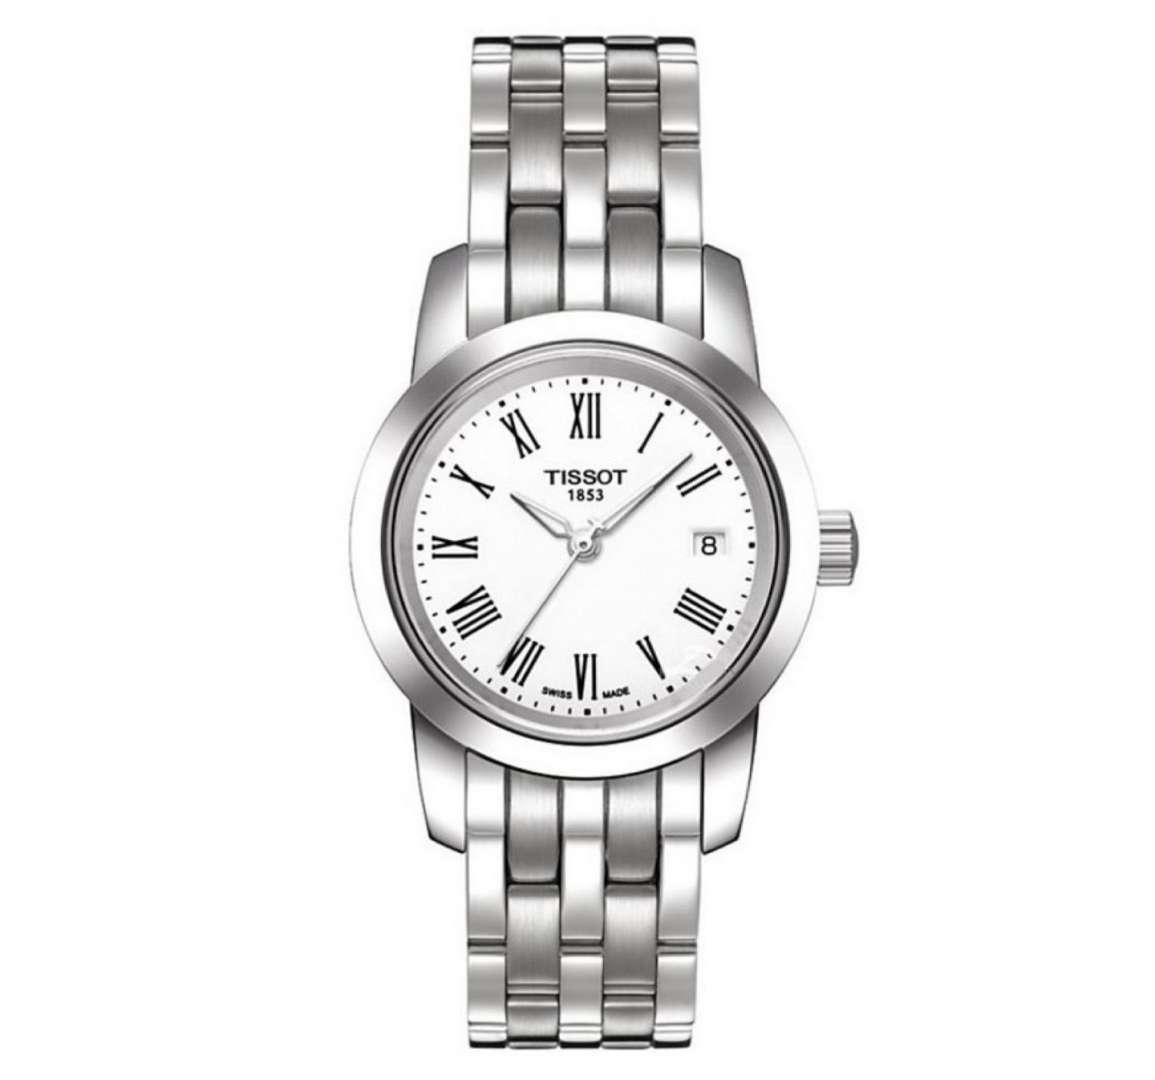 שעון יד אנלוגי tissot t033.210.11.013.00 טיסו